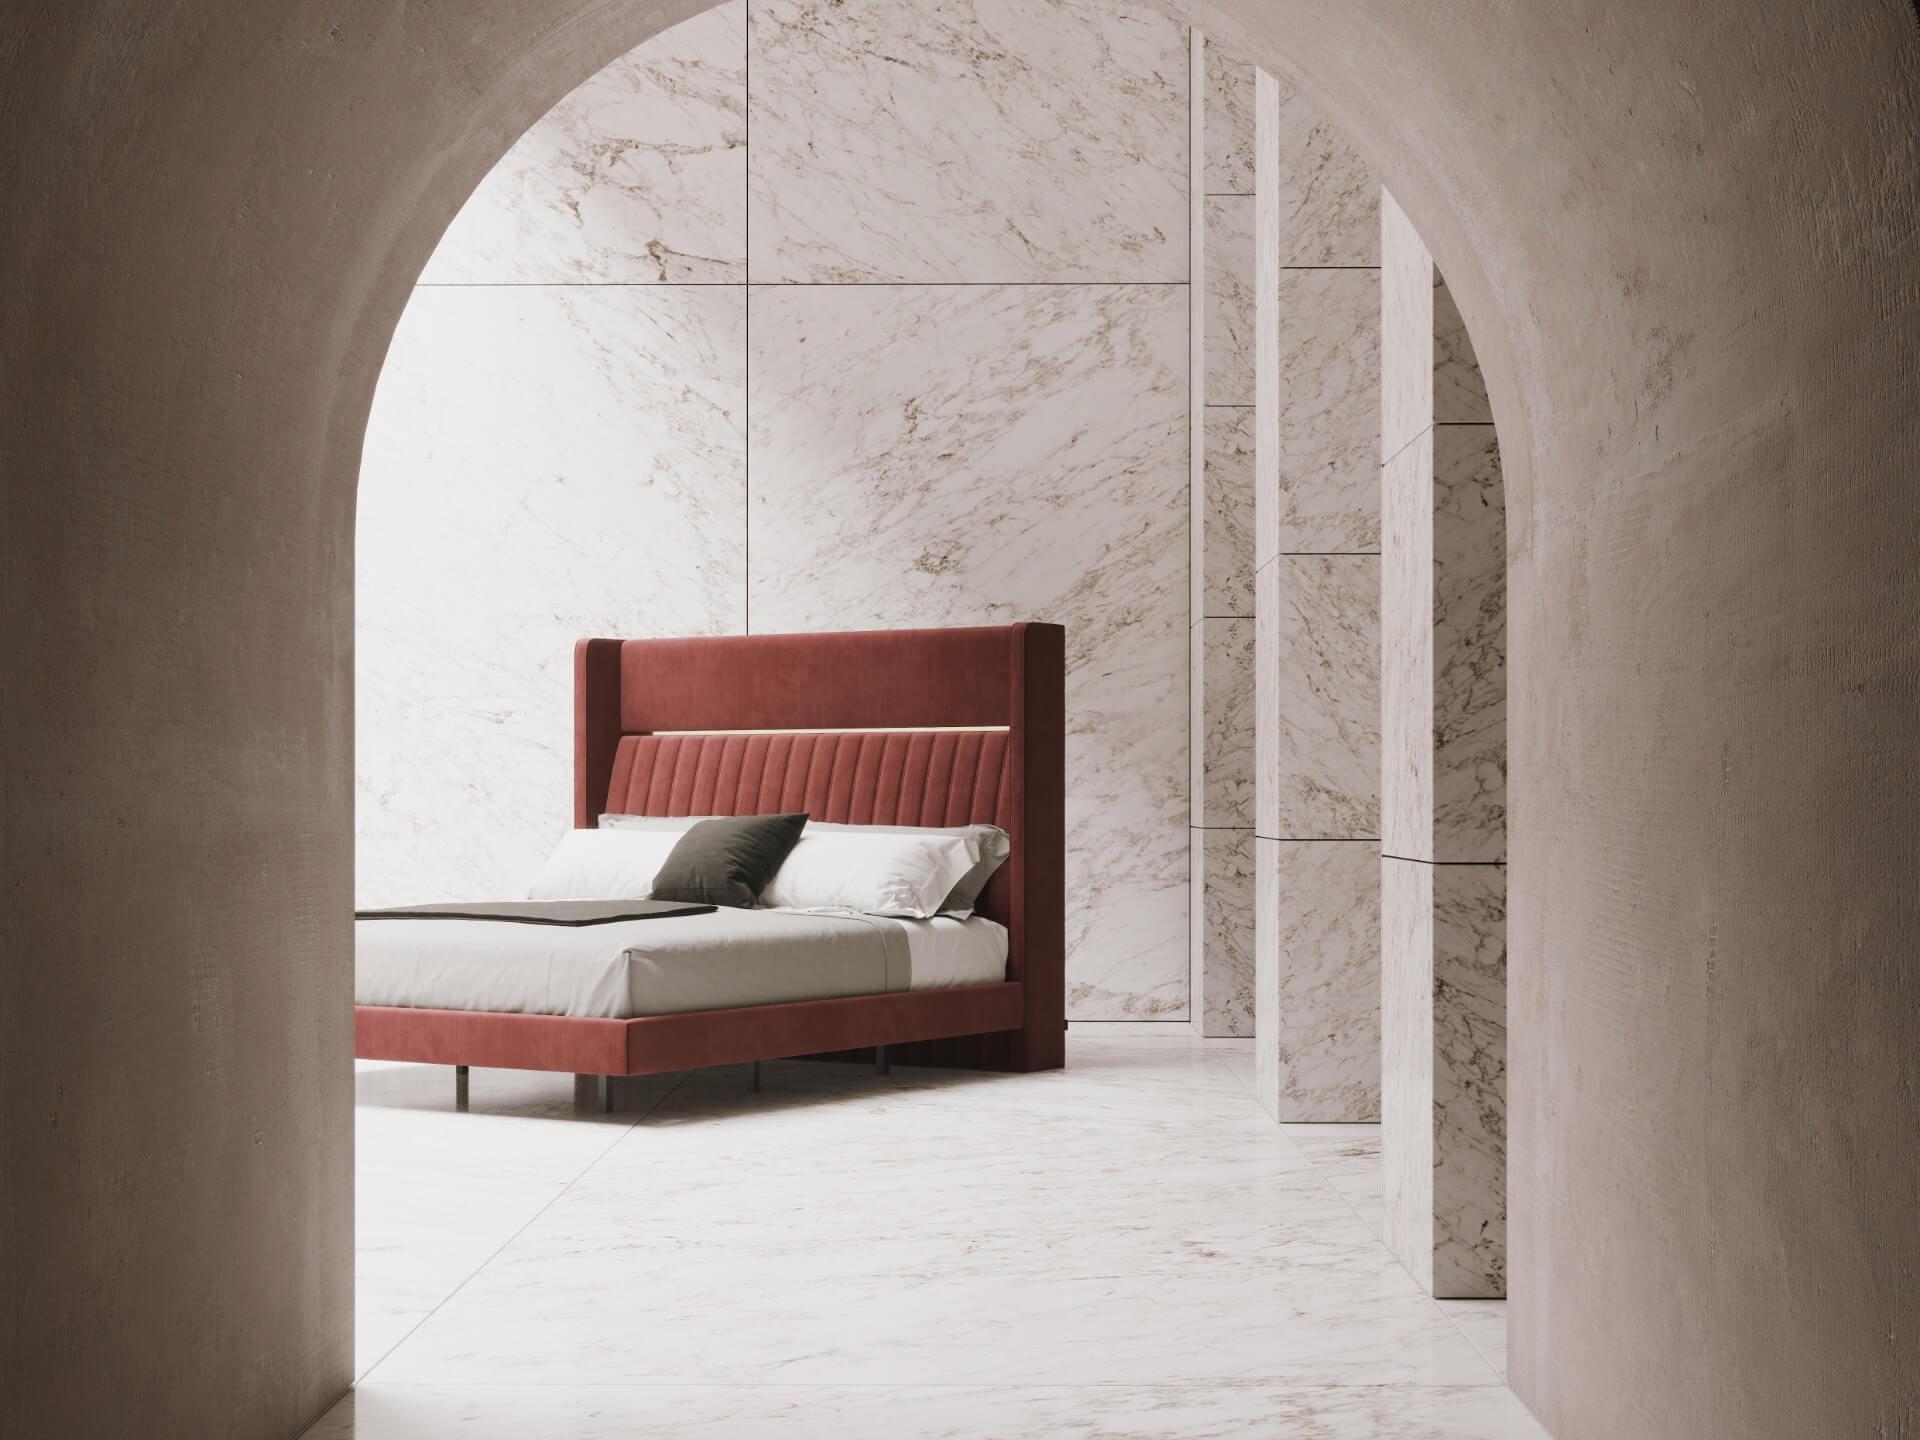 dormitorios-domkapa-interiorismo-velvet-upholstered-furniture